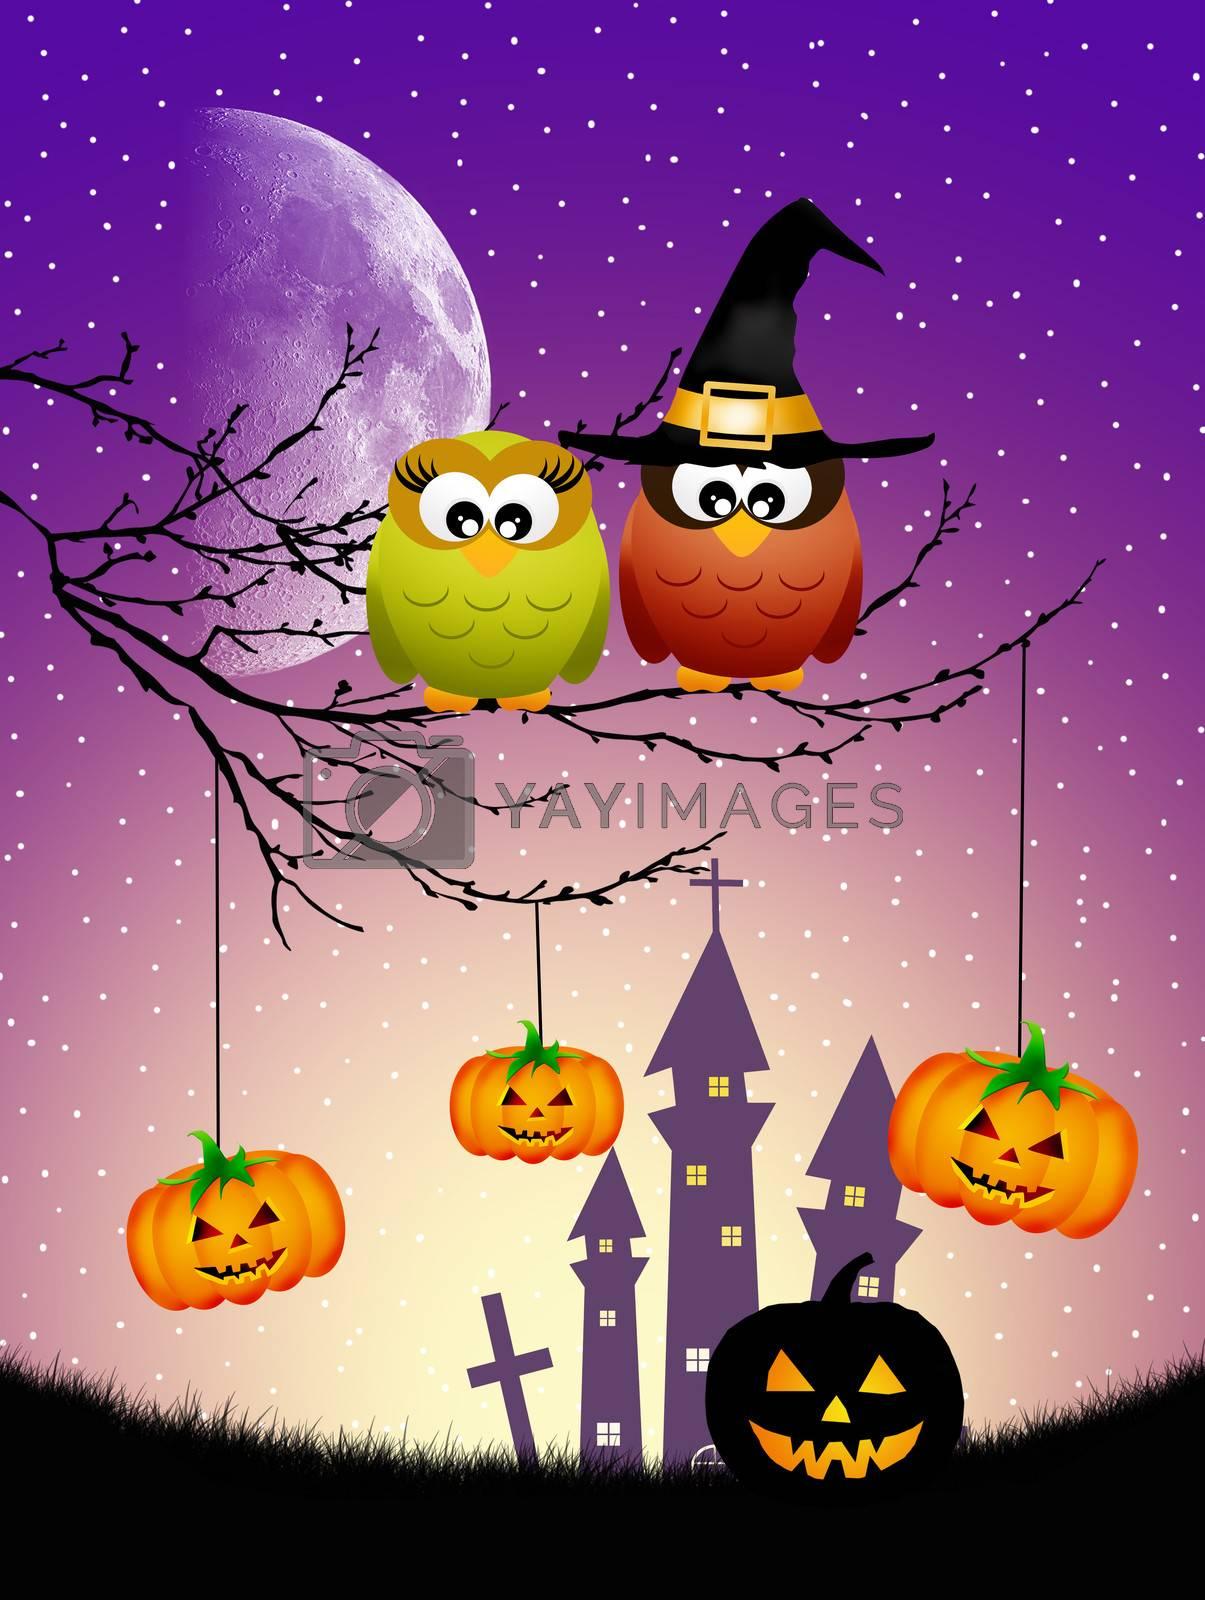 illustration of owls of Halloween